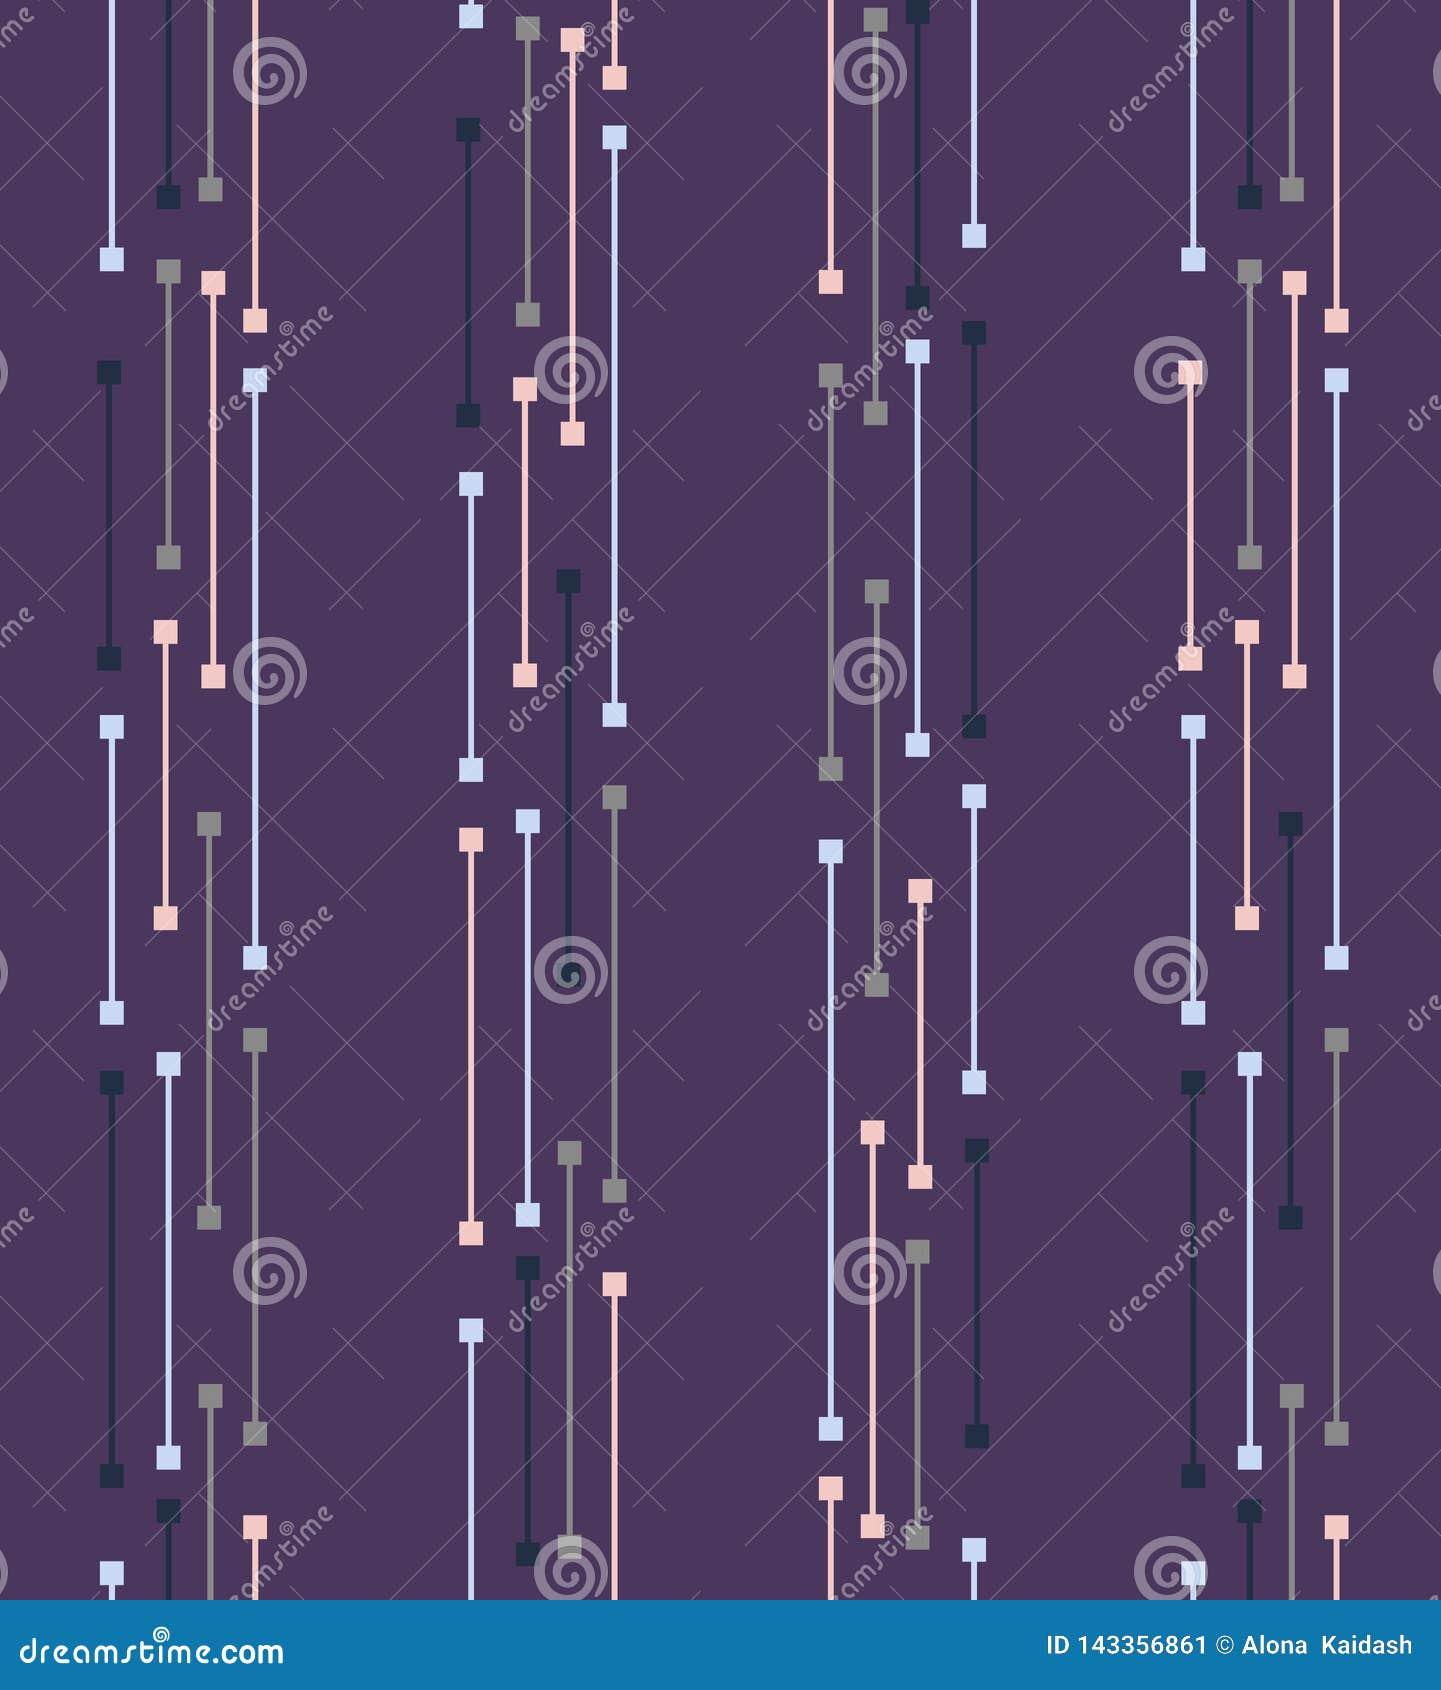 Geometric seamless pattern with circles, stripes, dots.